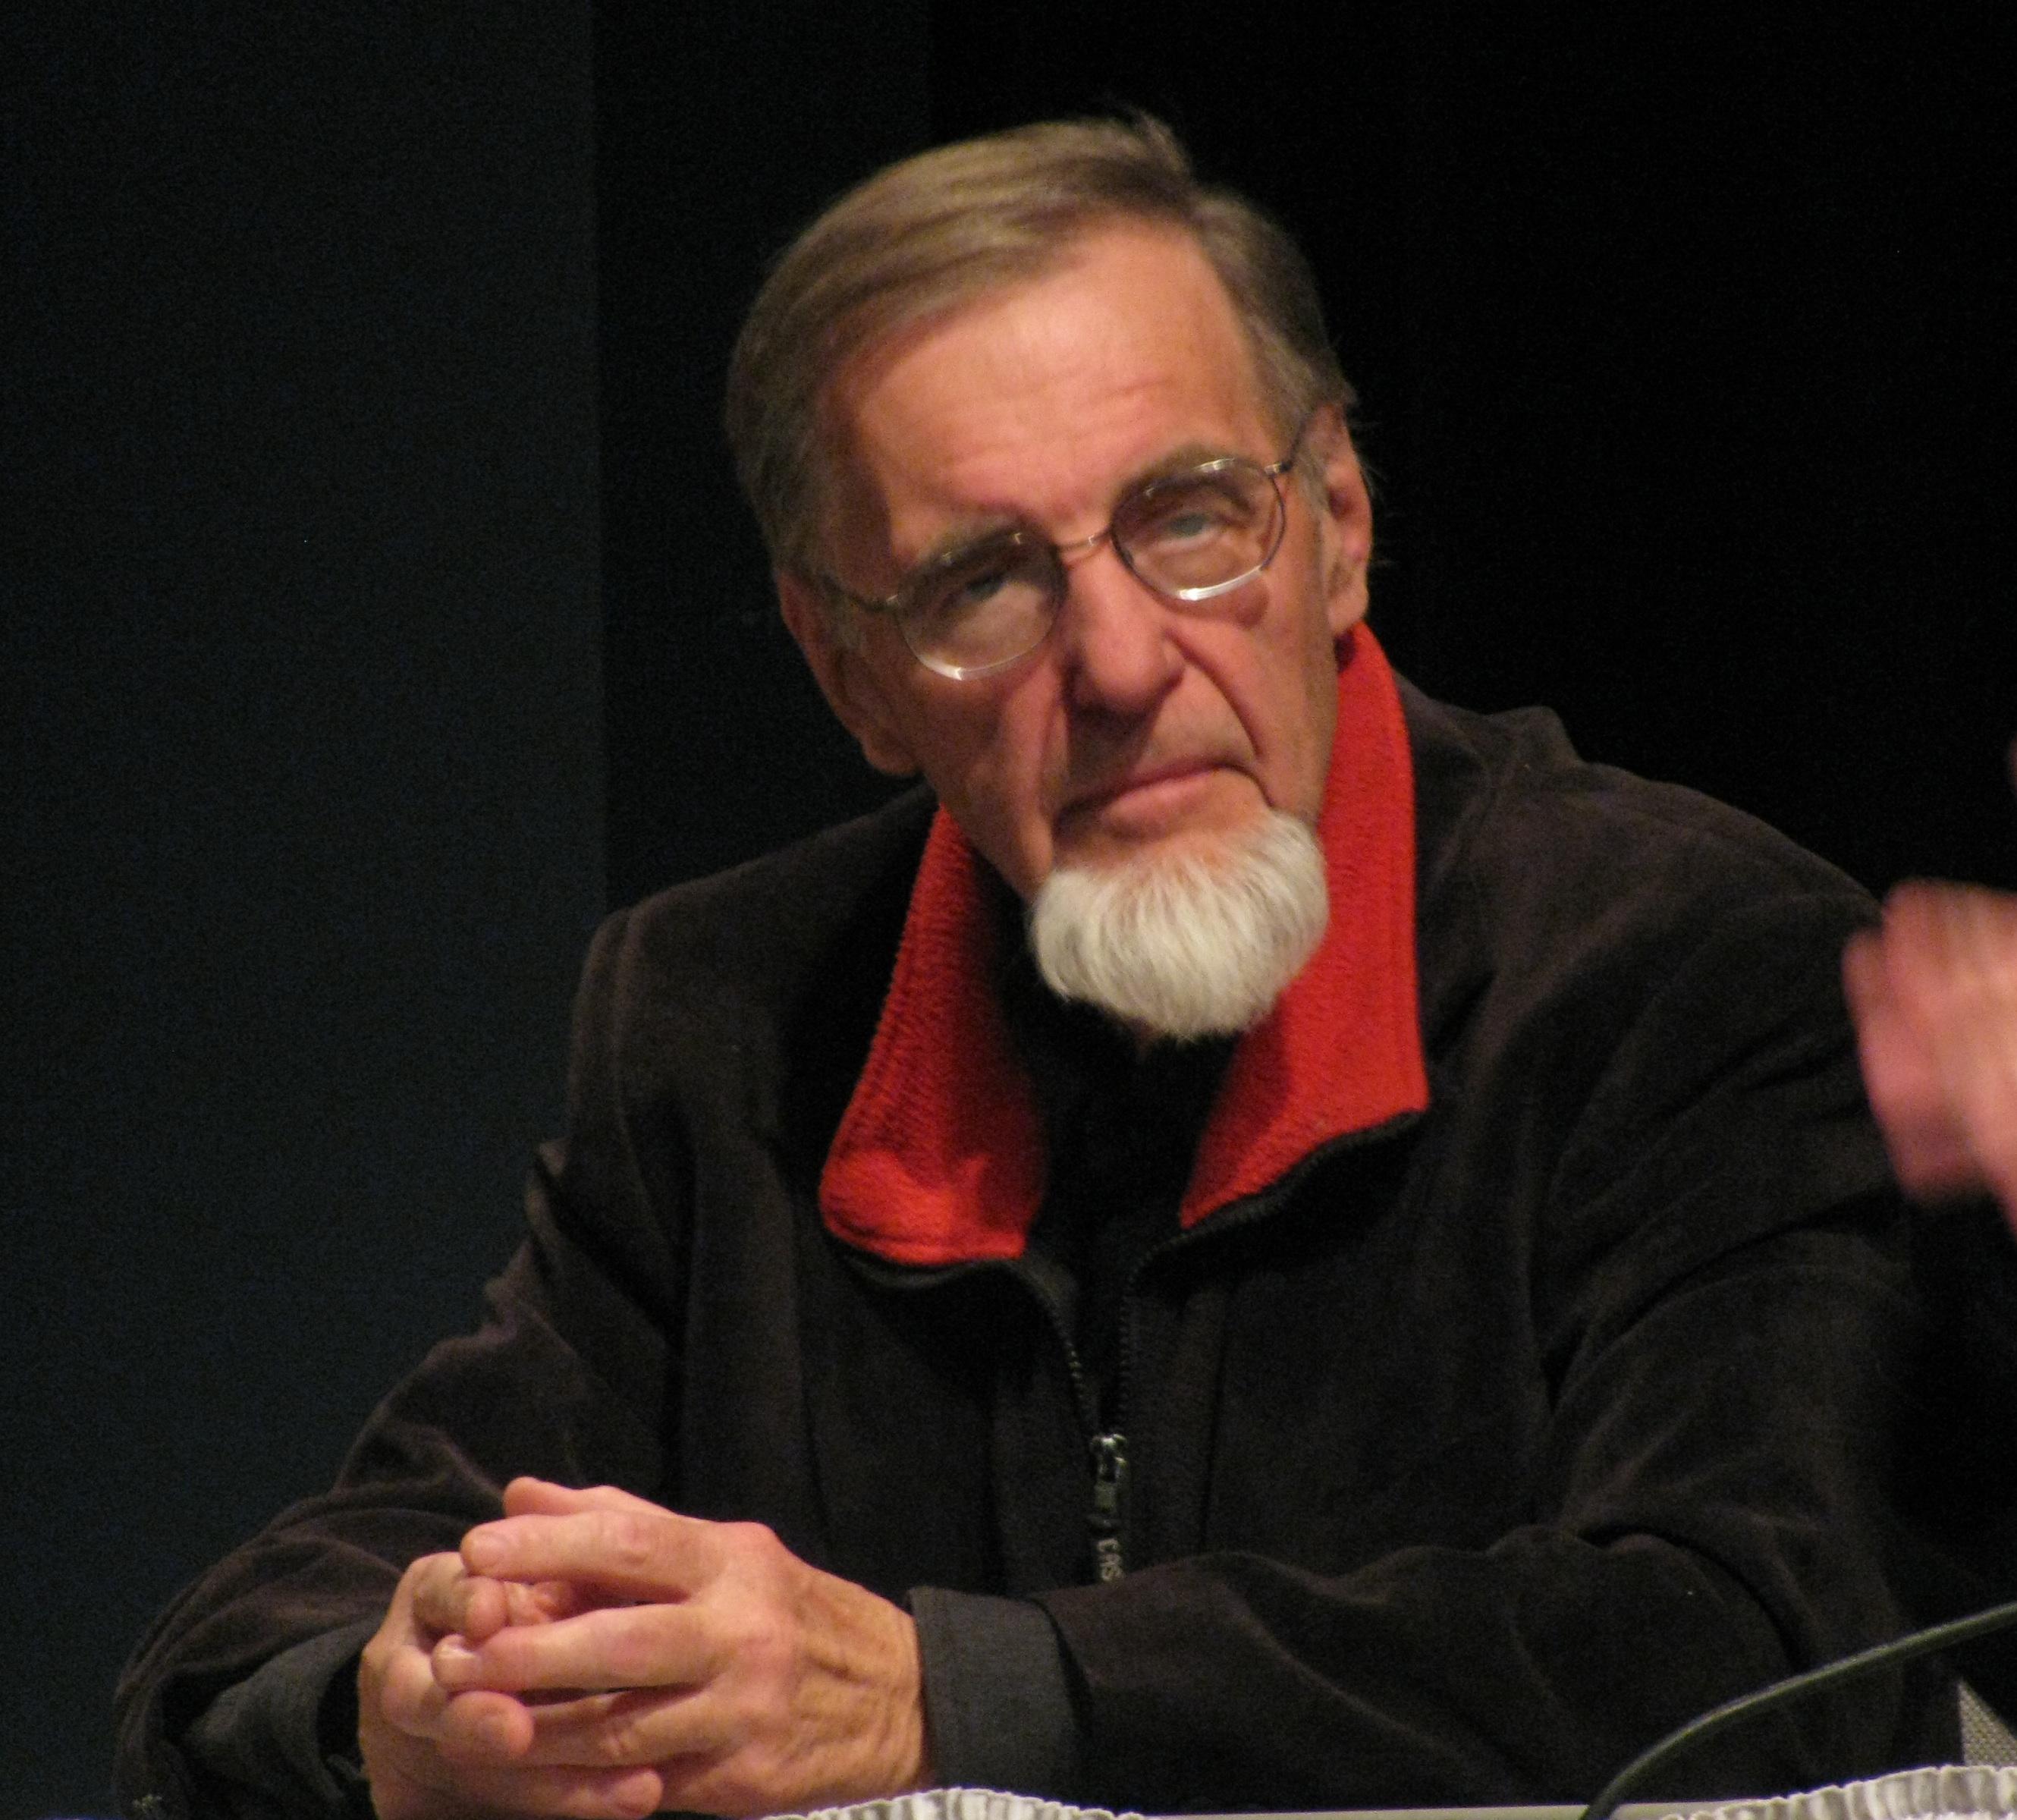 Image of Woody Vasulka from Wikidata